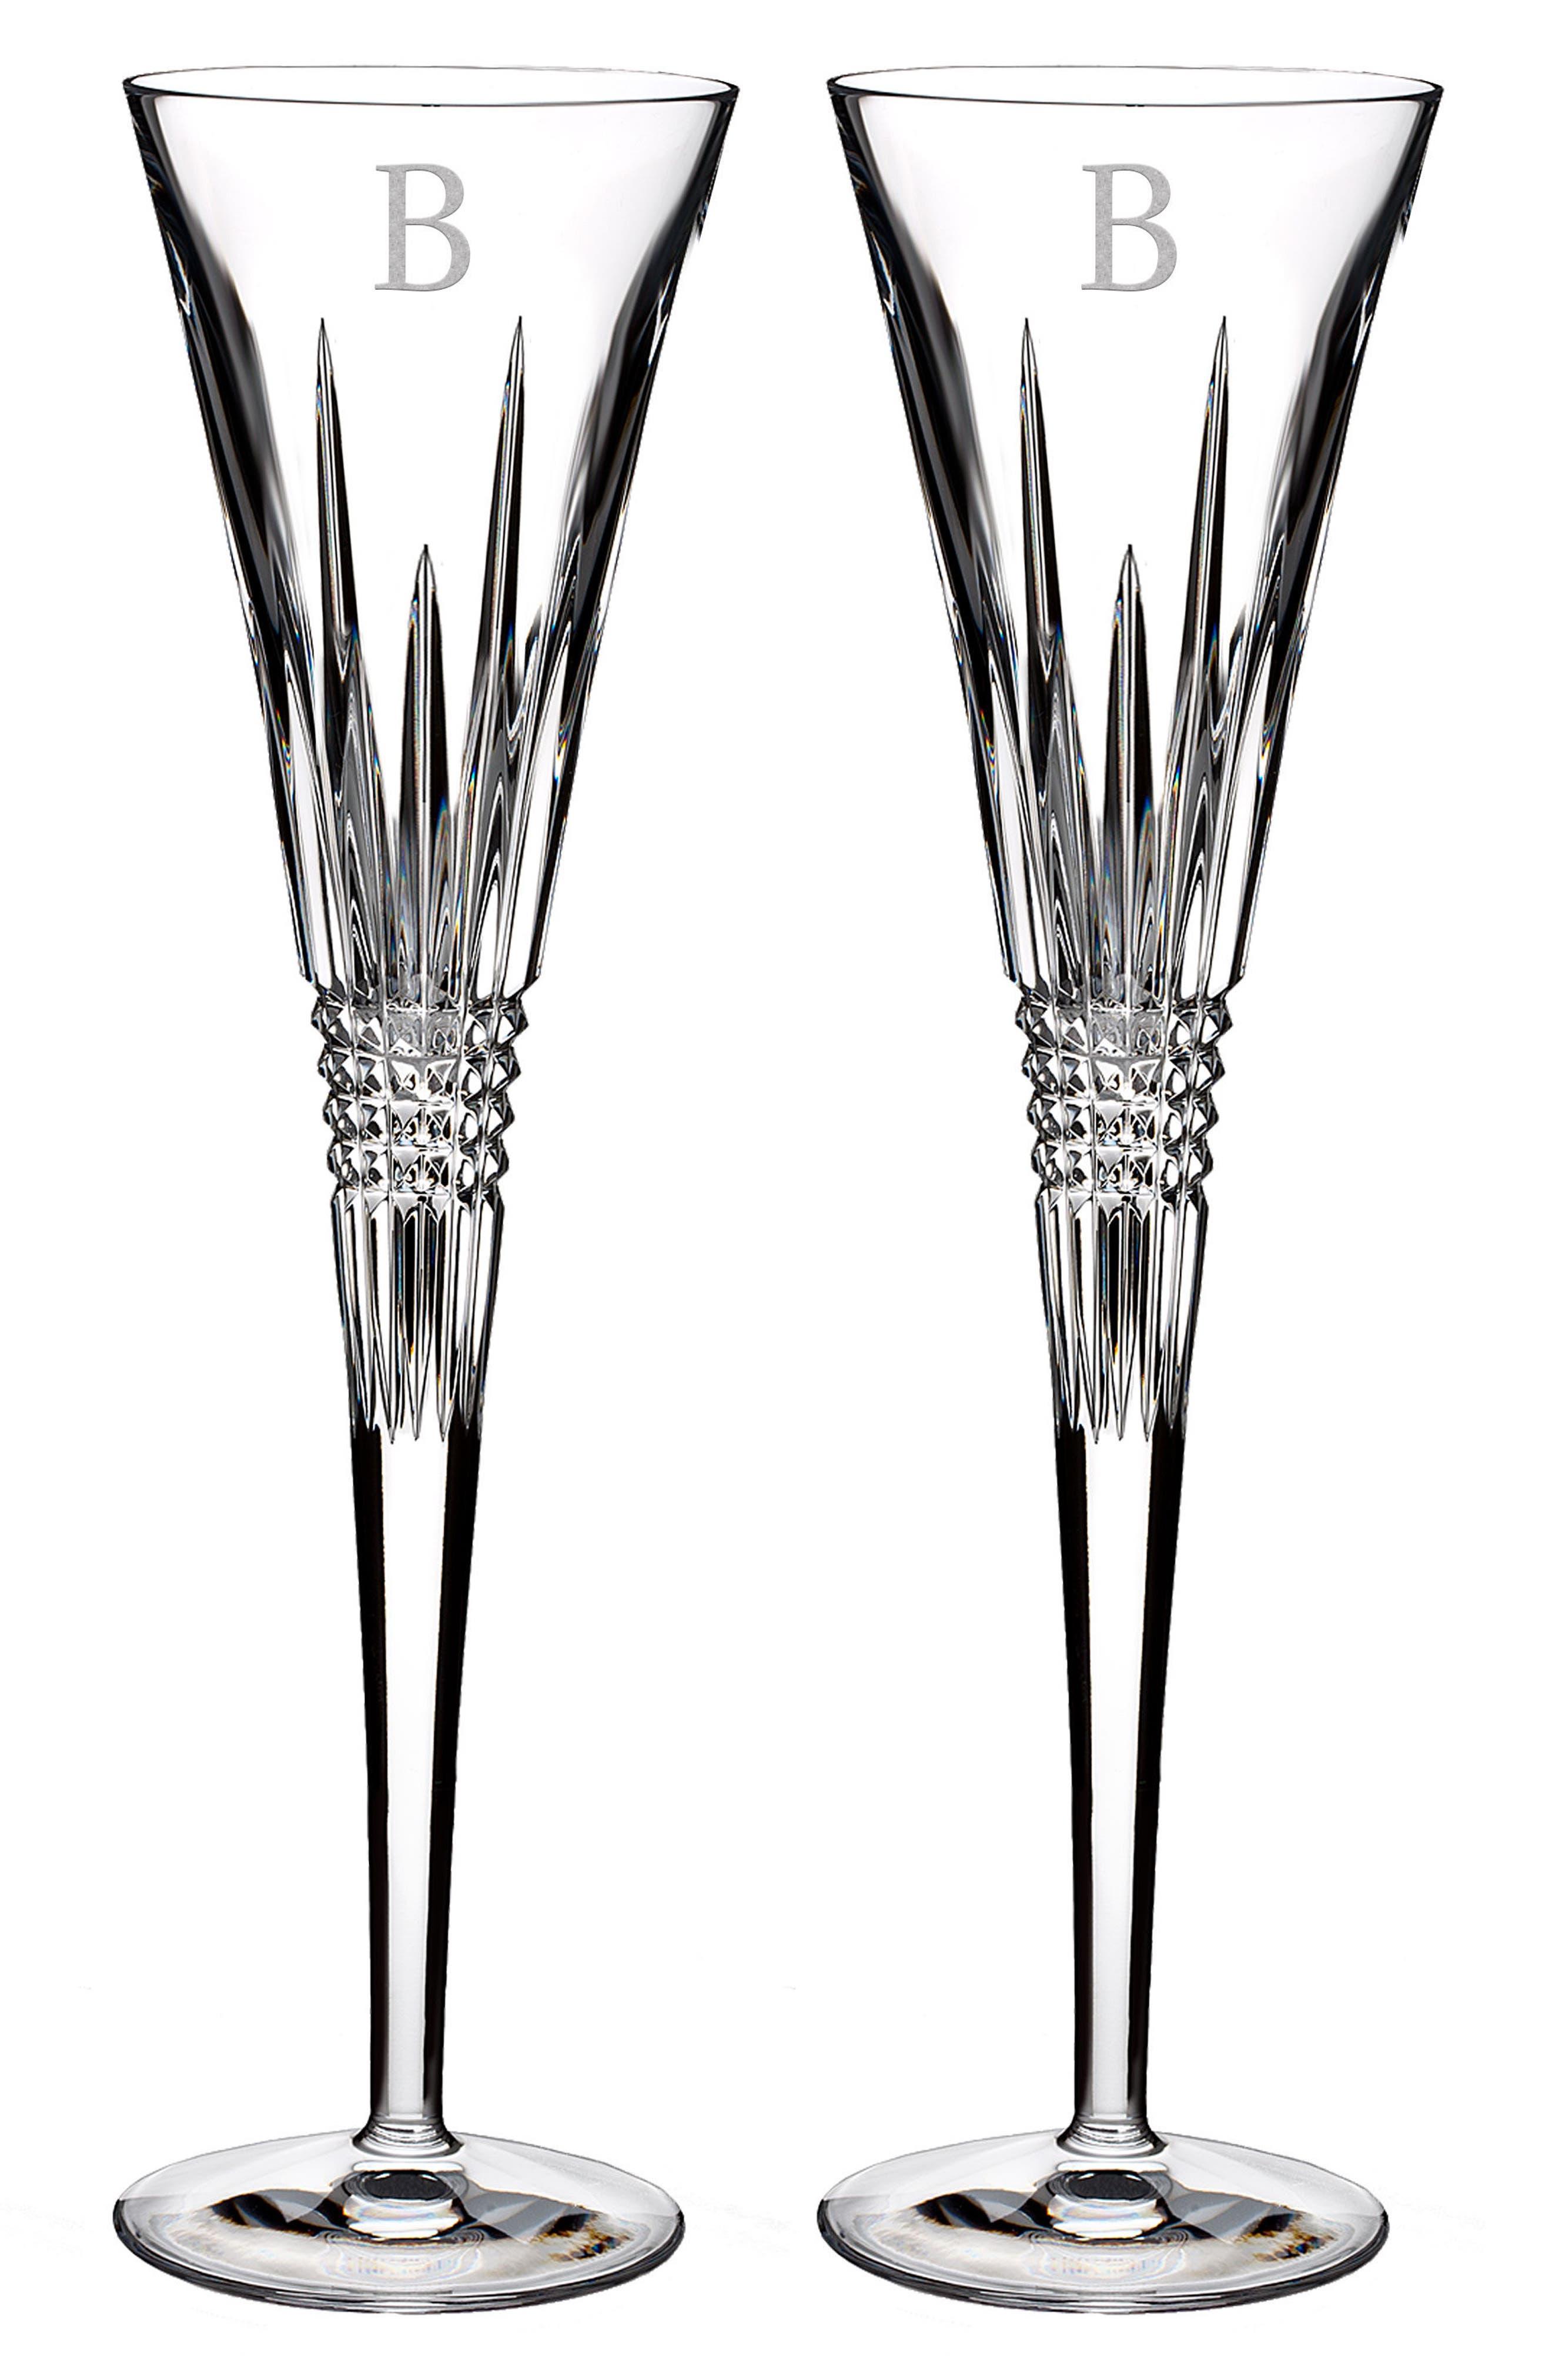 Lismore Diamond Set of 2 Monogram Lead Crystal Champagne Flutes,                             Main thumbnail 1, color,                             CLEAR - B